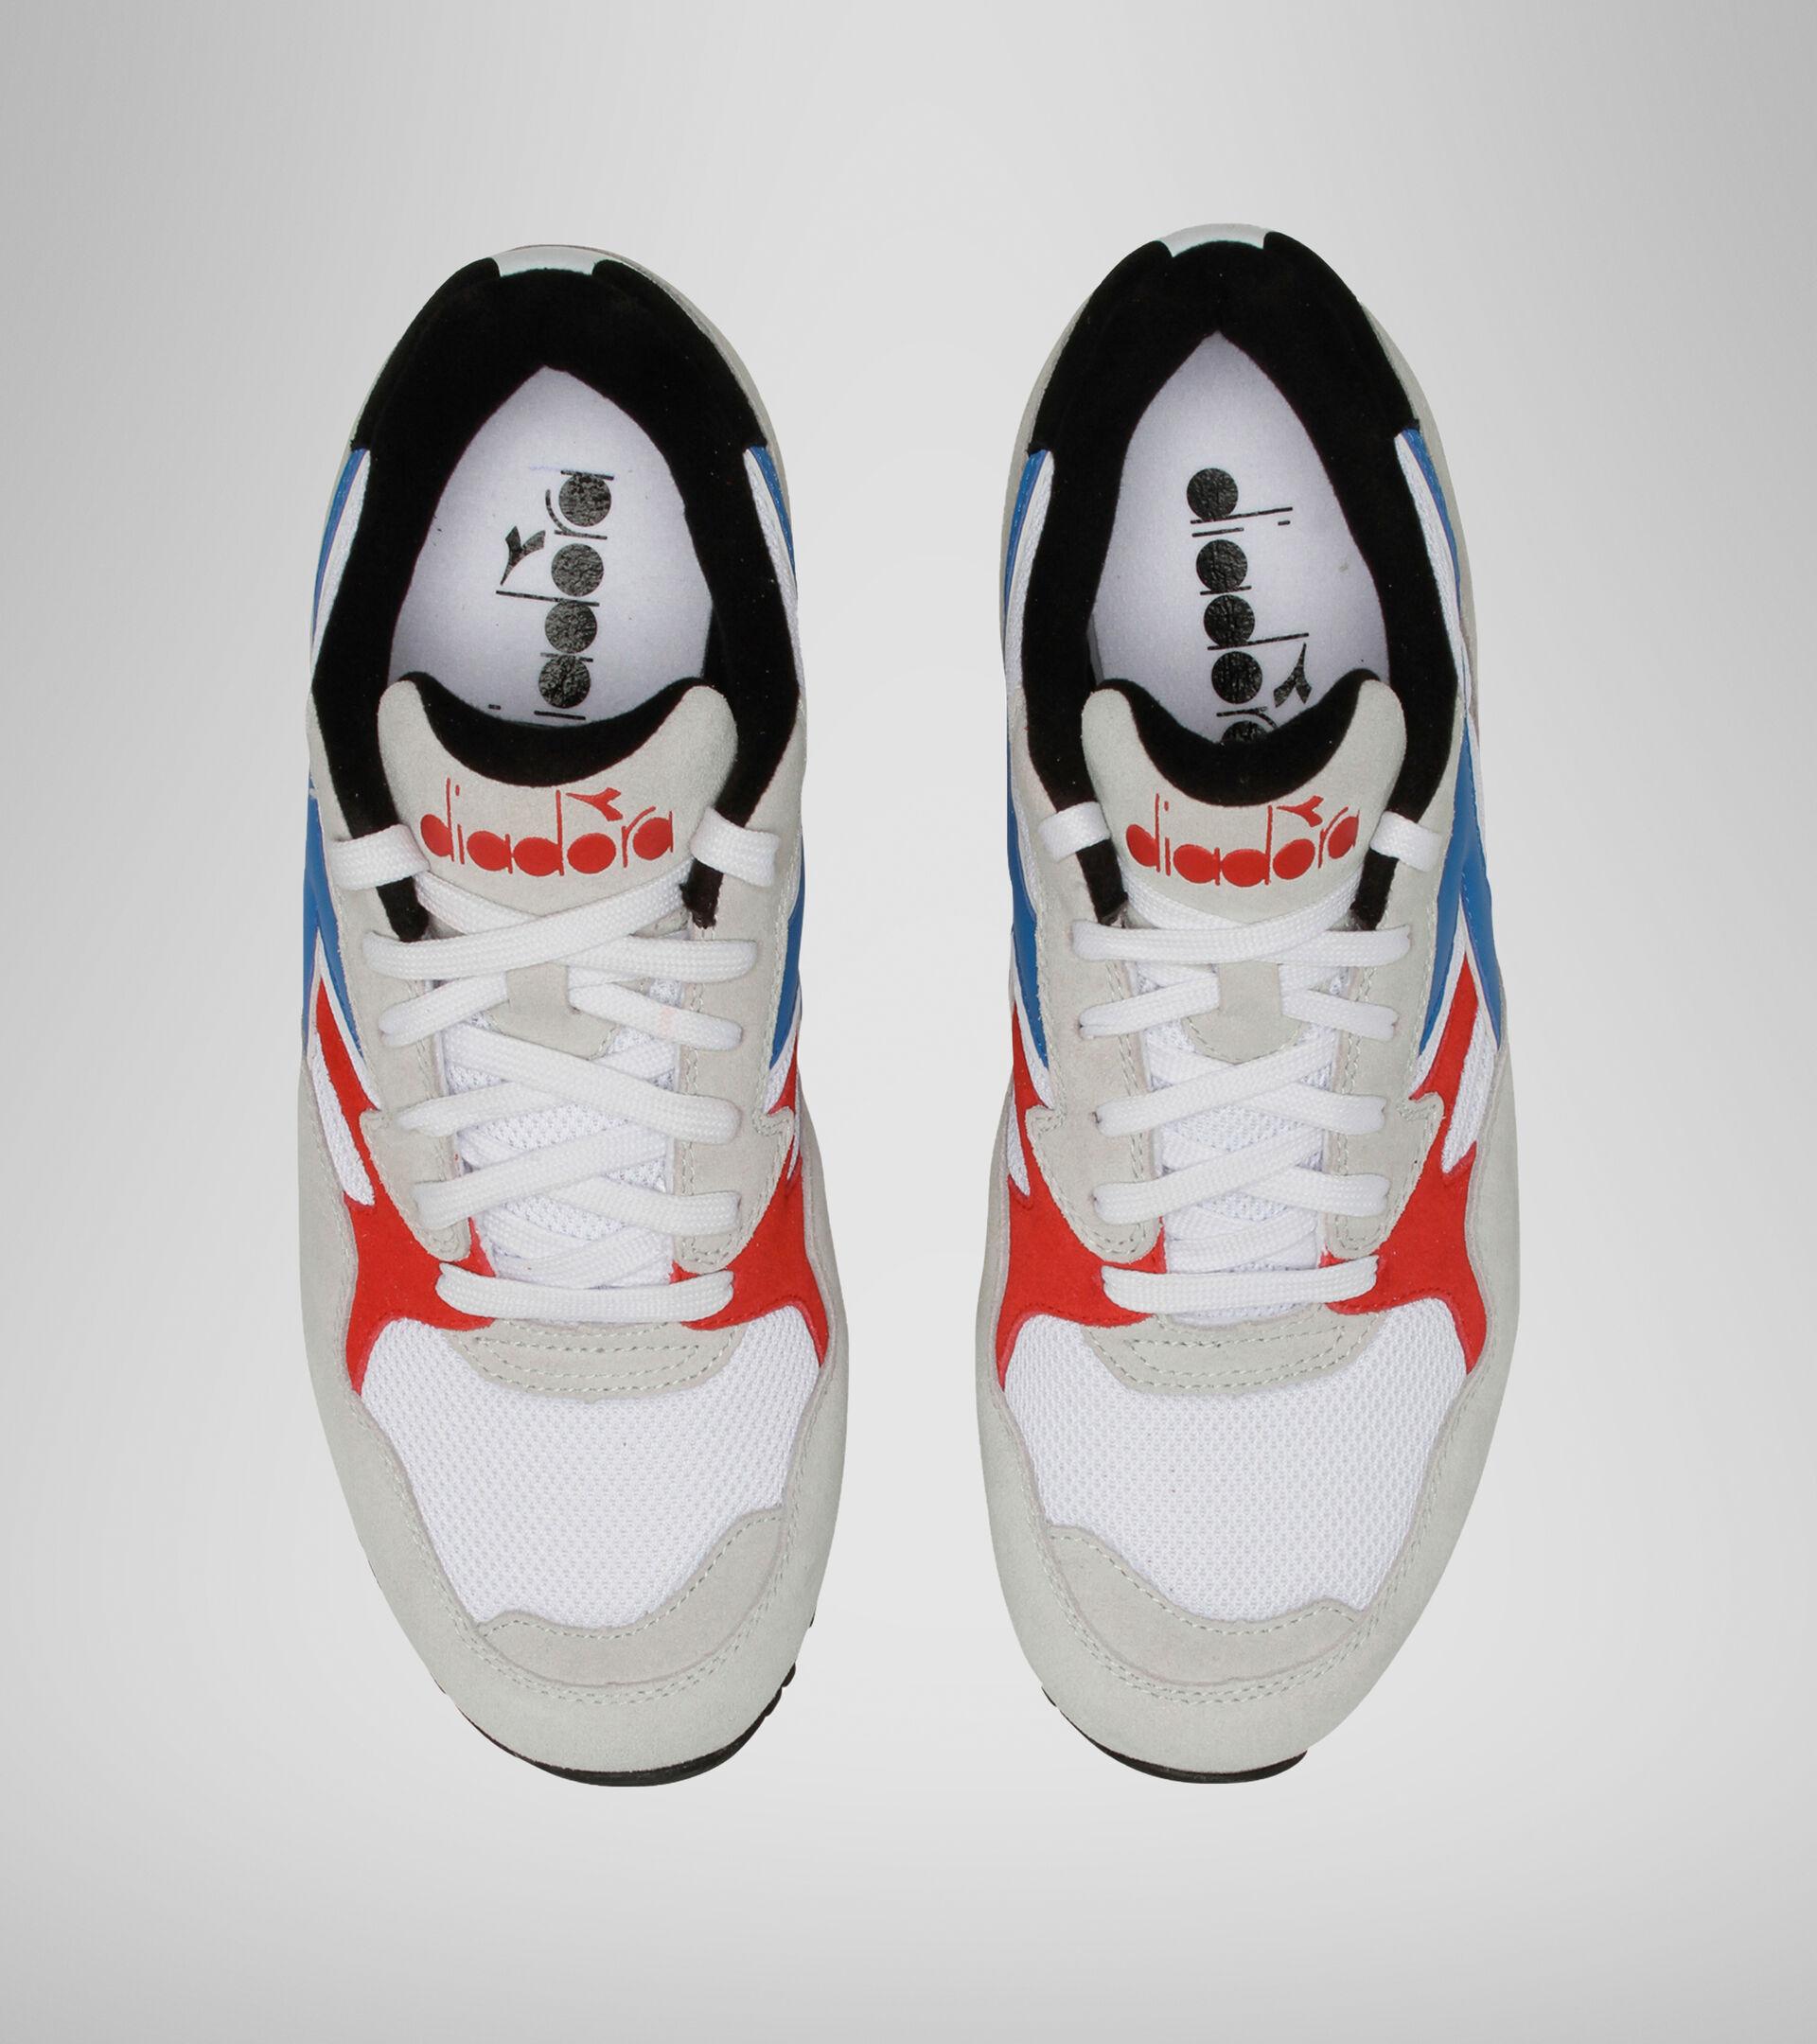 Footwear Sportswear UNISEX N902 S BLCO/AZL LUMINOSO/ROJO INTENSO Diadora